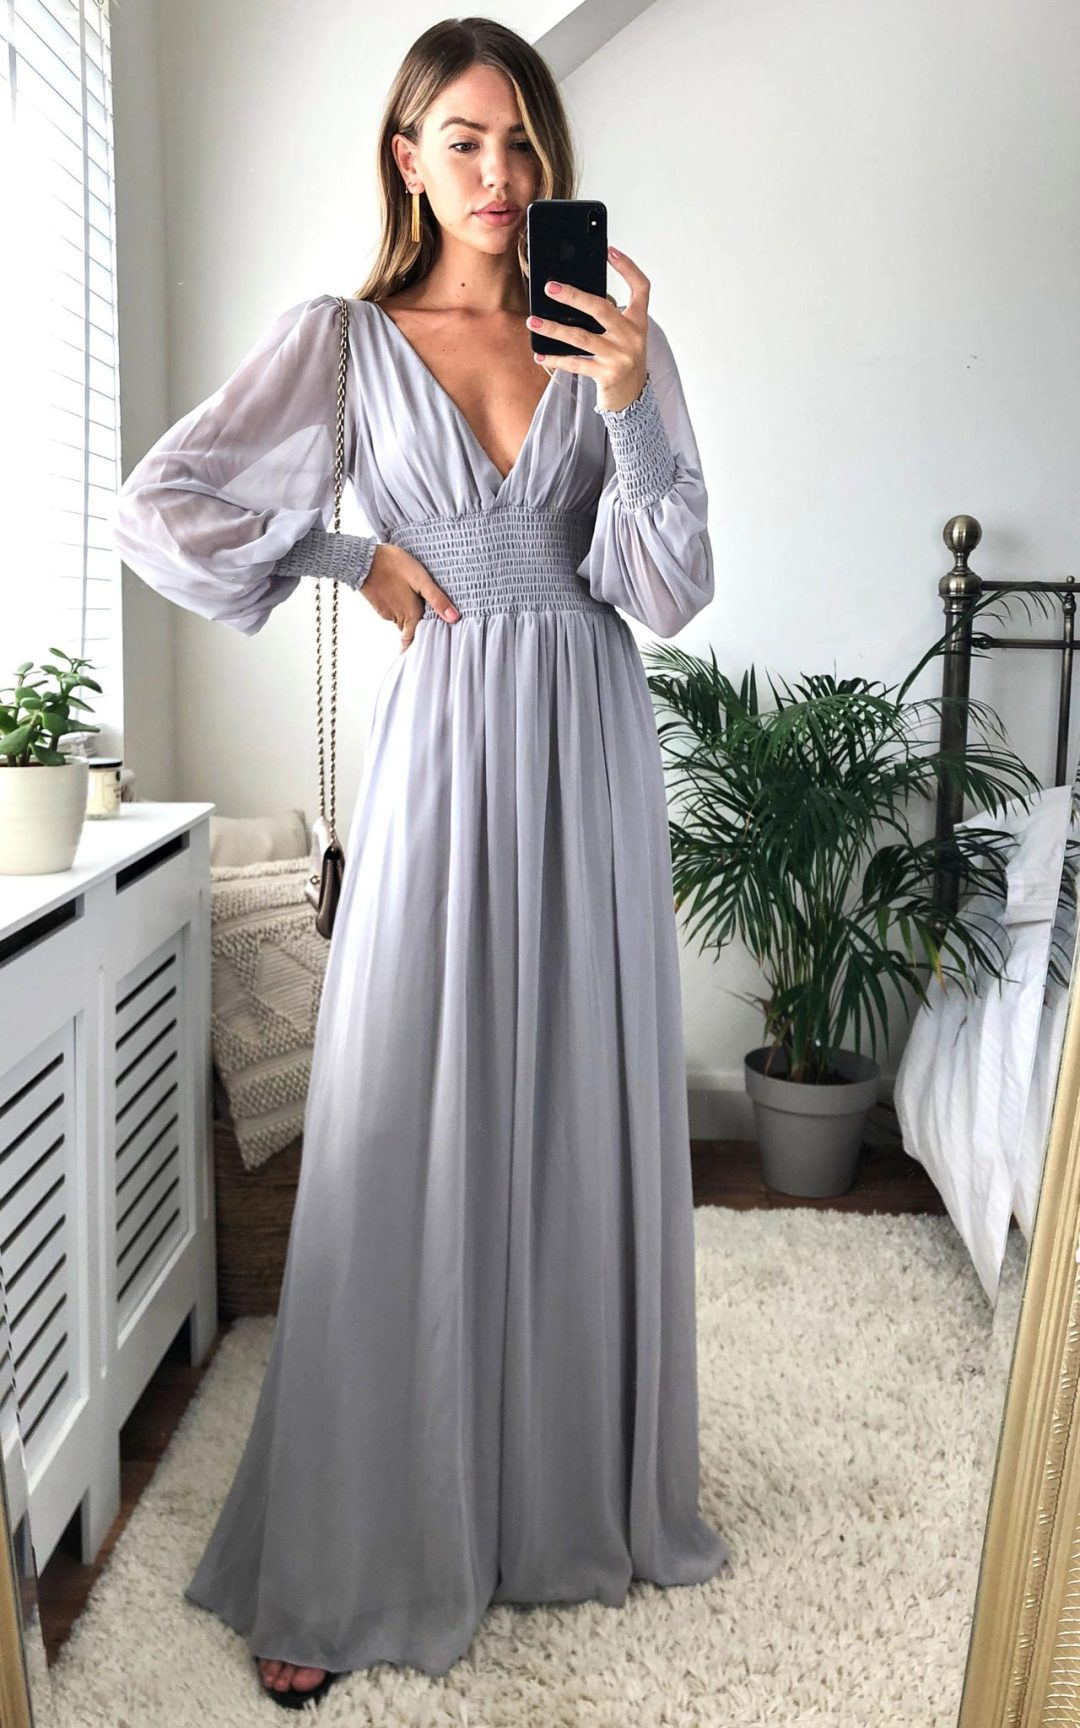 Affordable long grey bridesmaid dresses with long sleeves